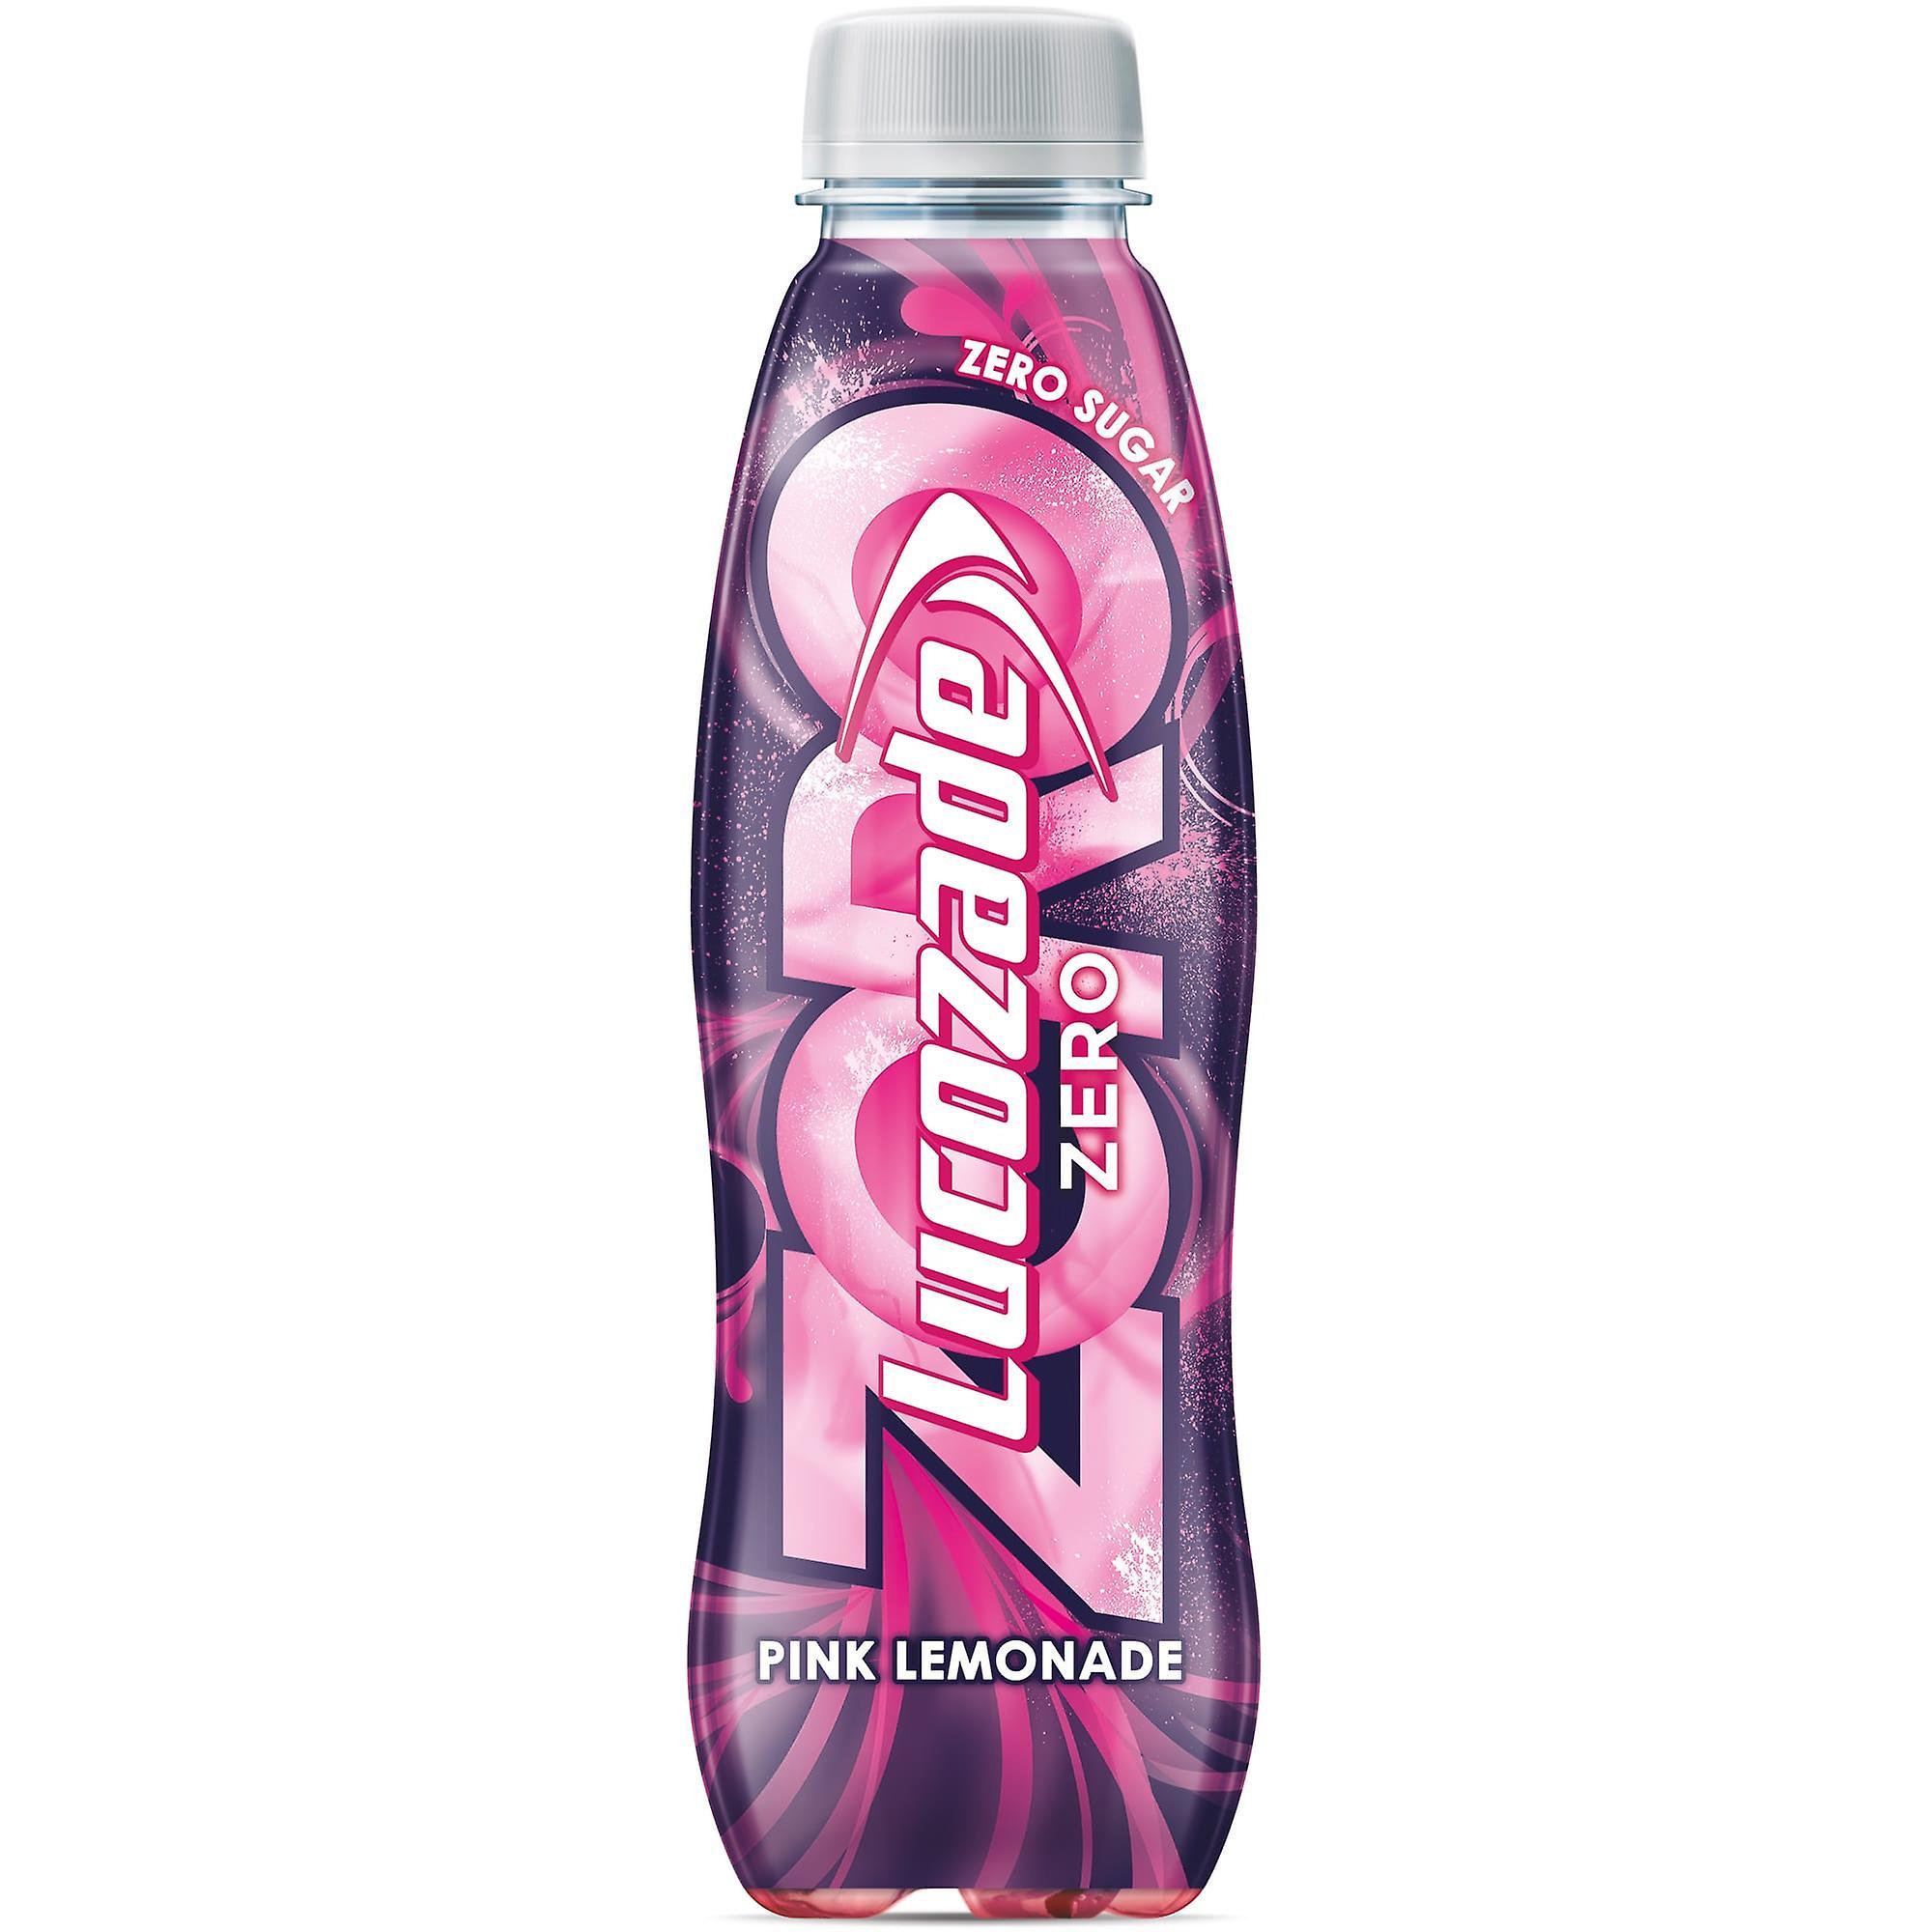 Lucozade Zero Sugar Free Pink Lemonade